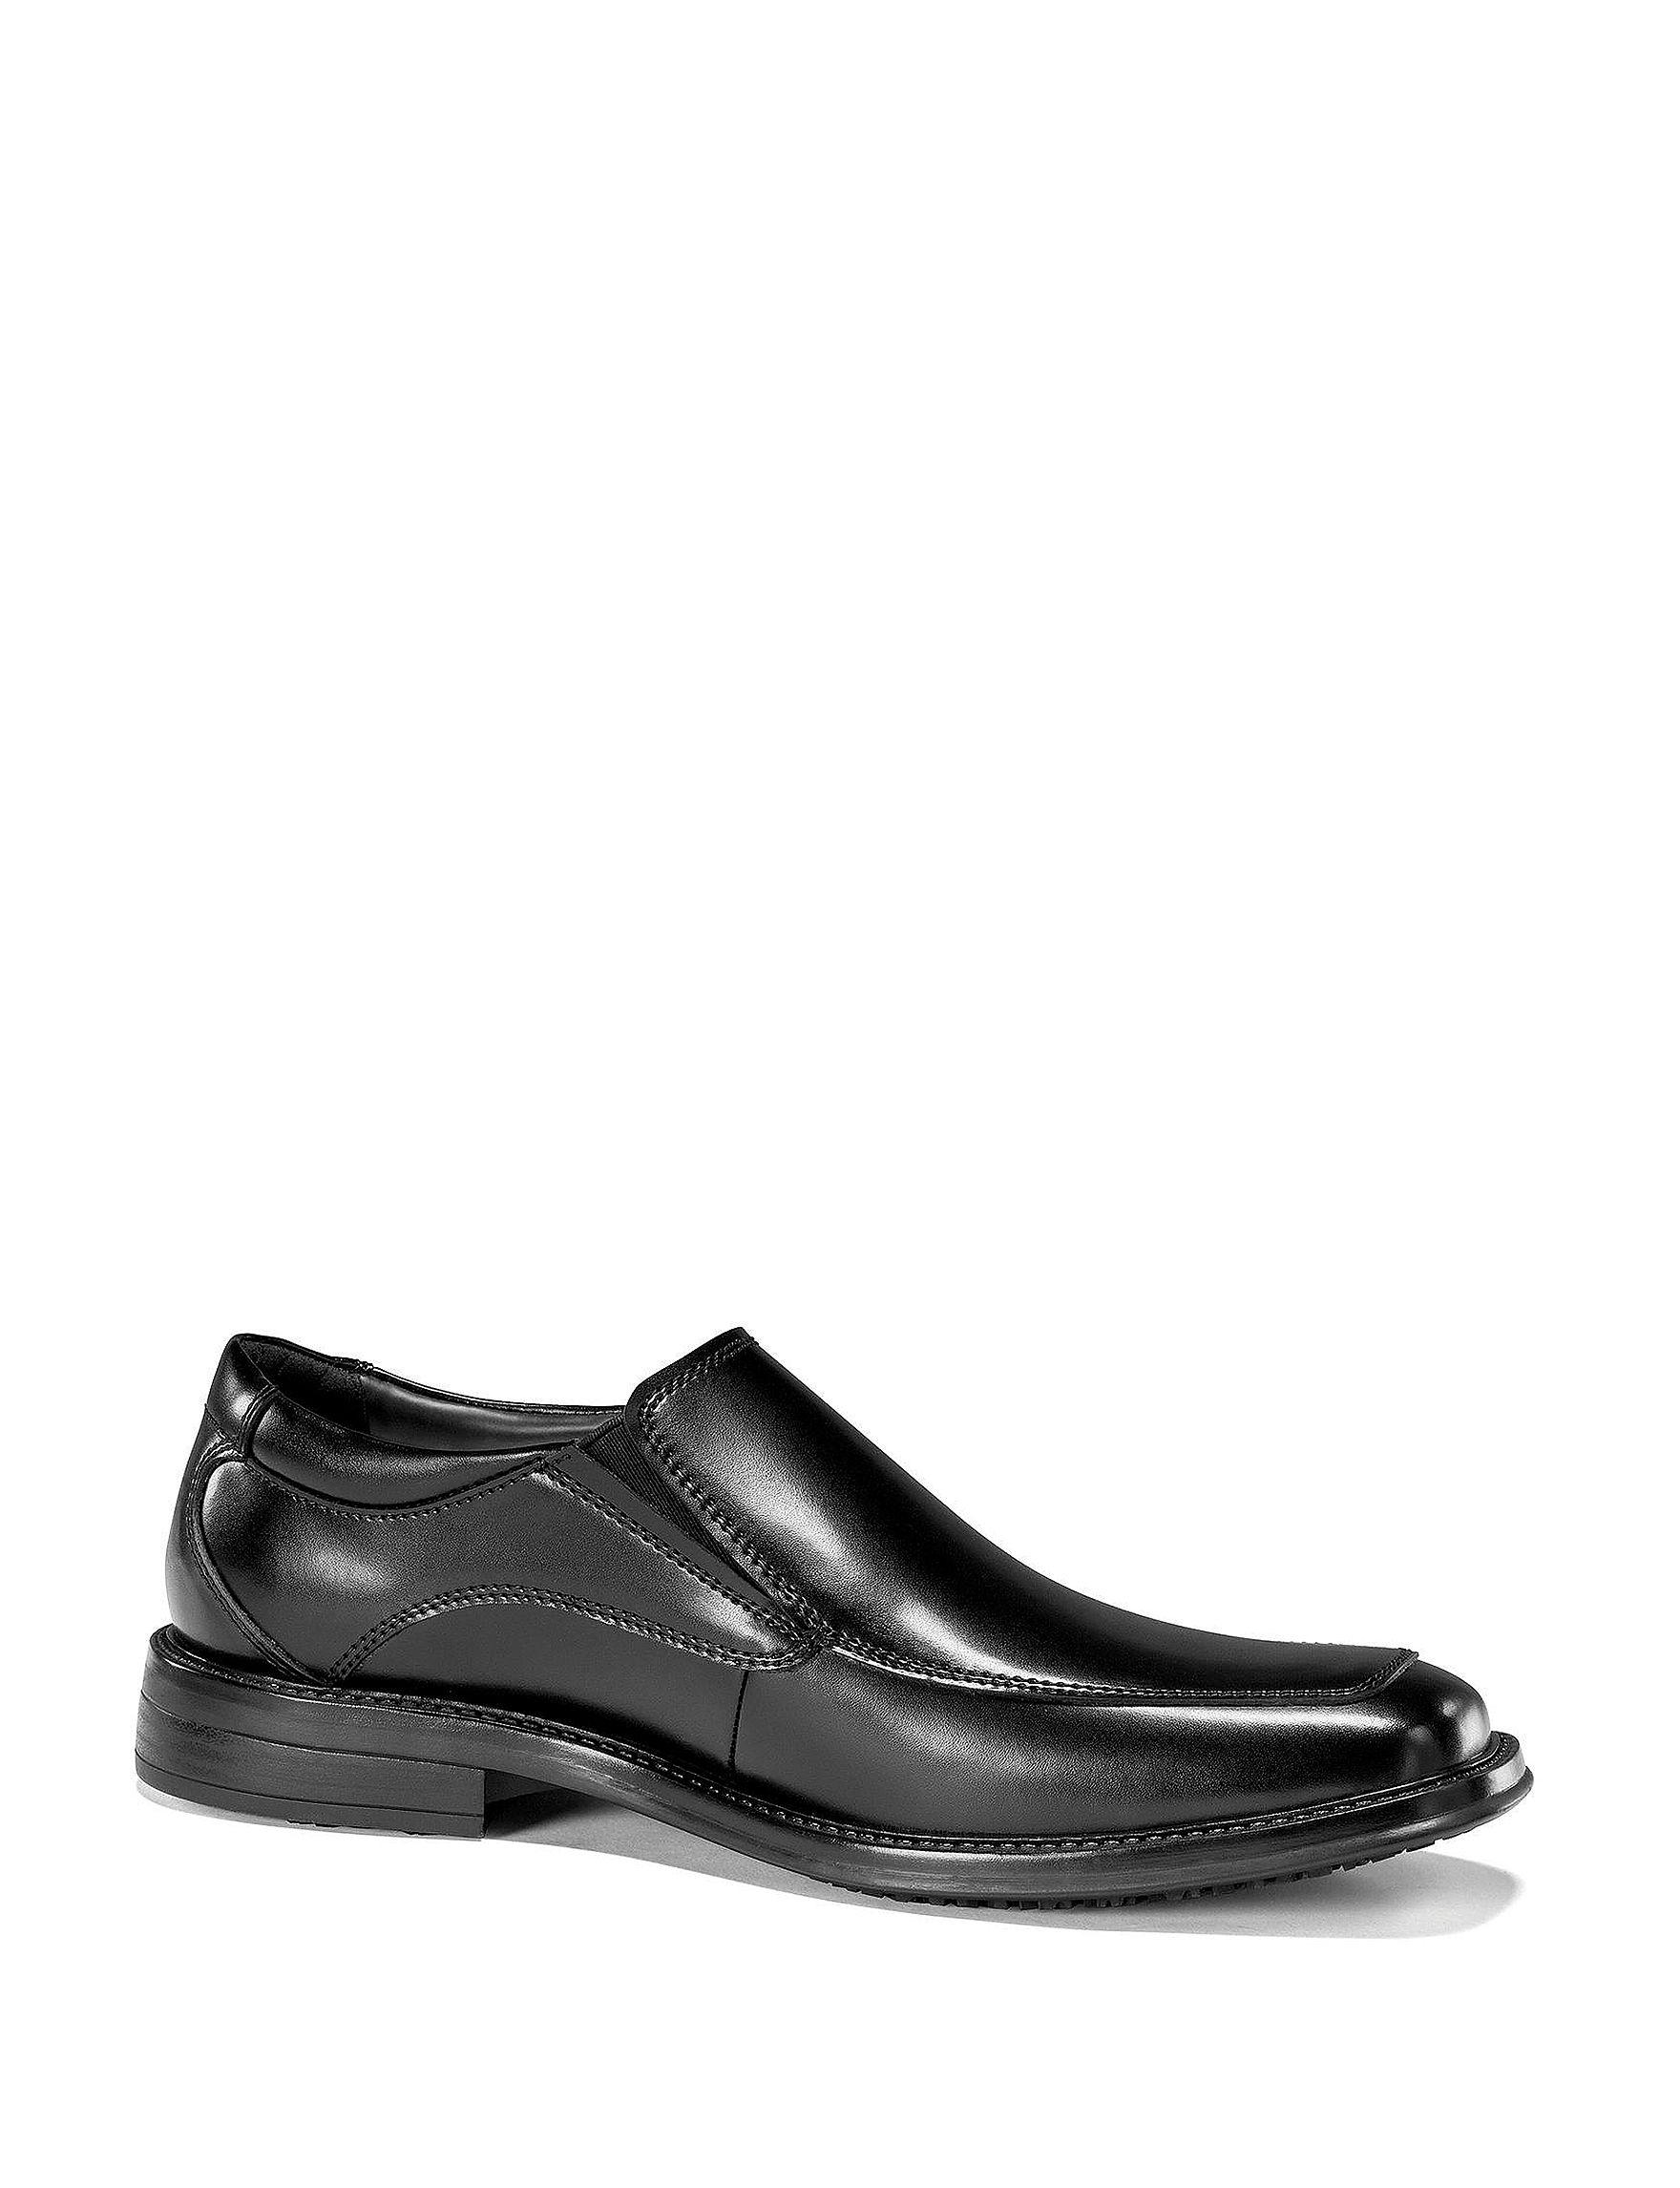 Dockers Black Slip Resistant